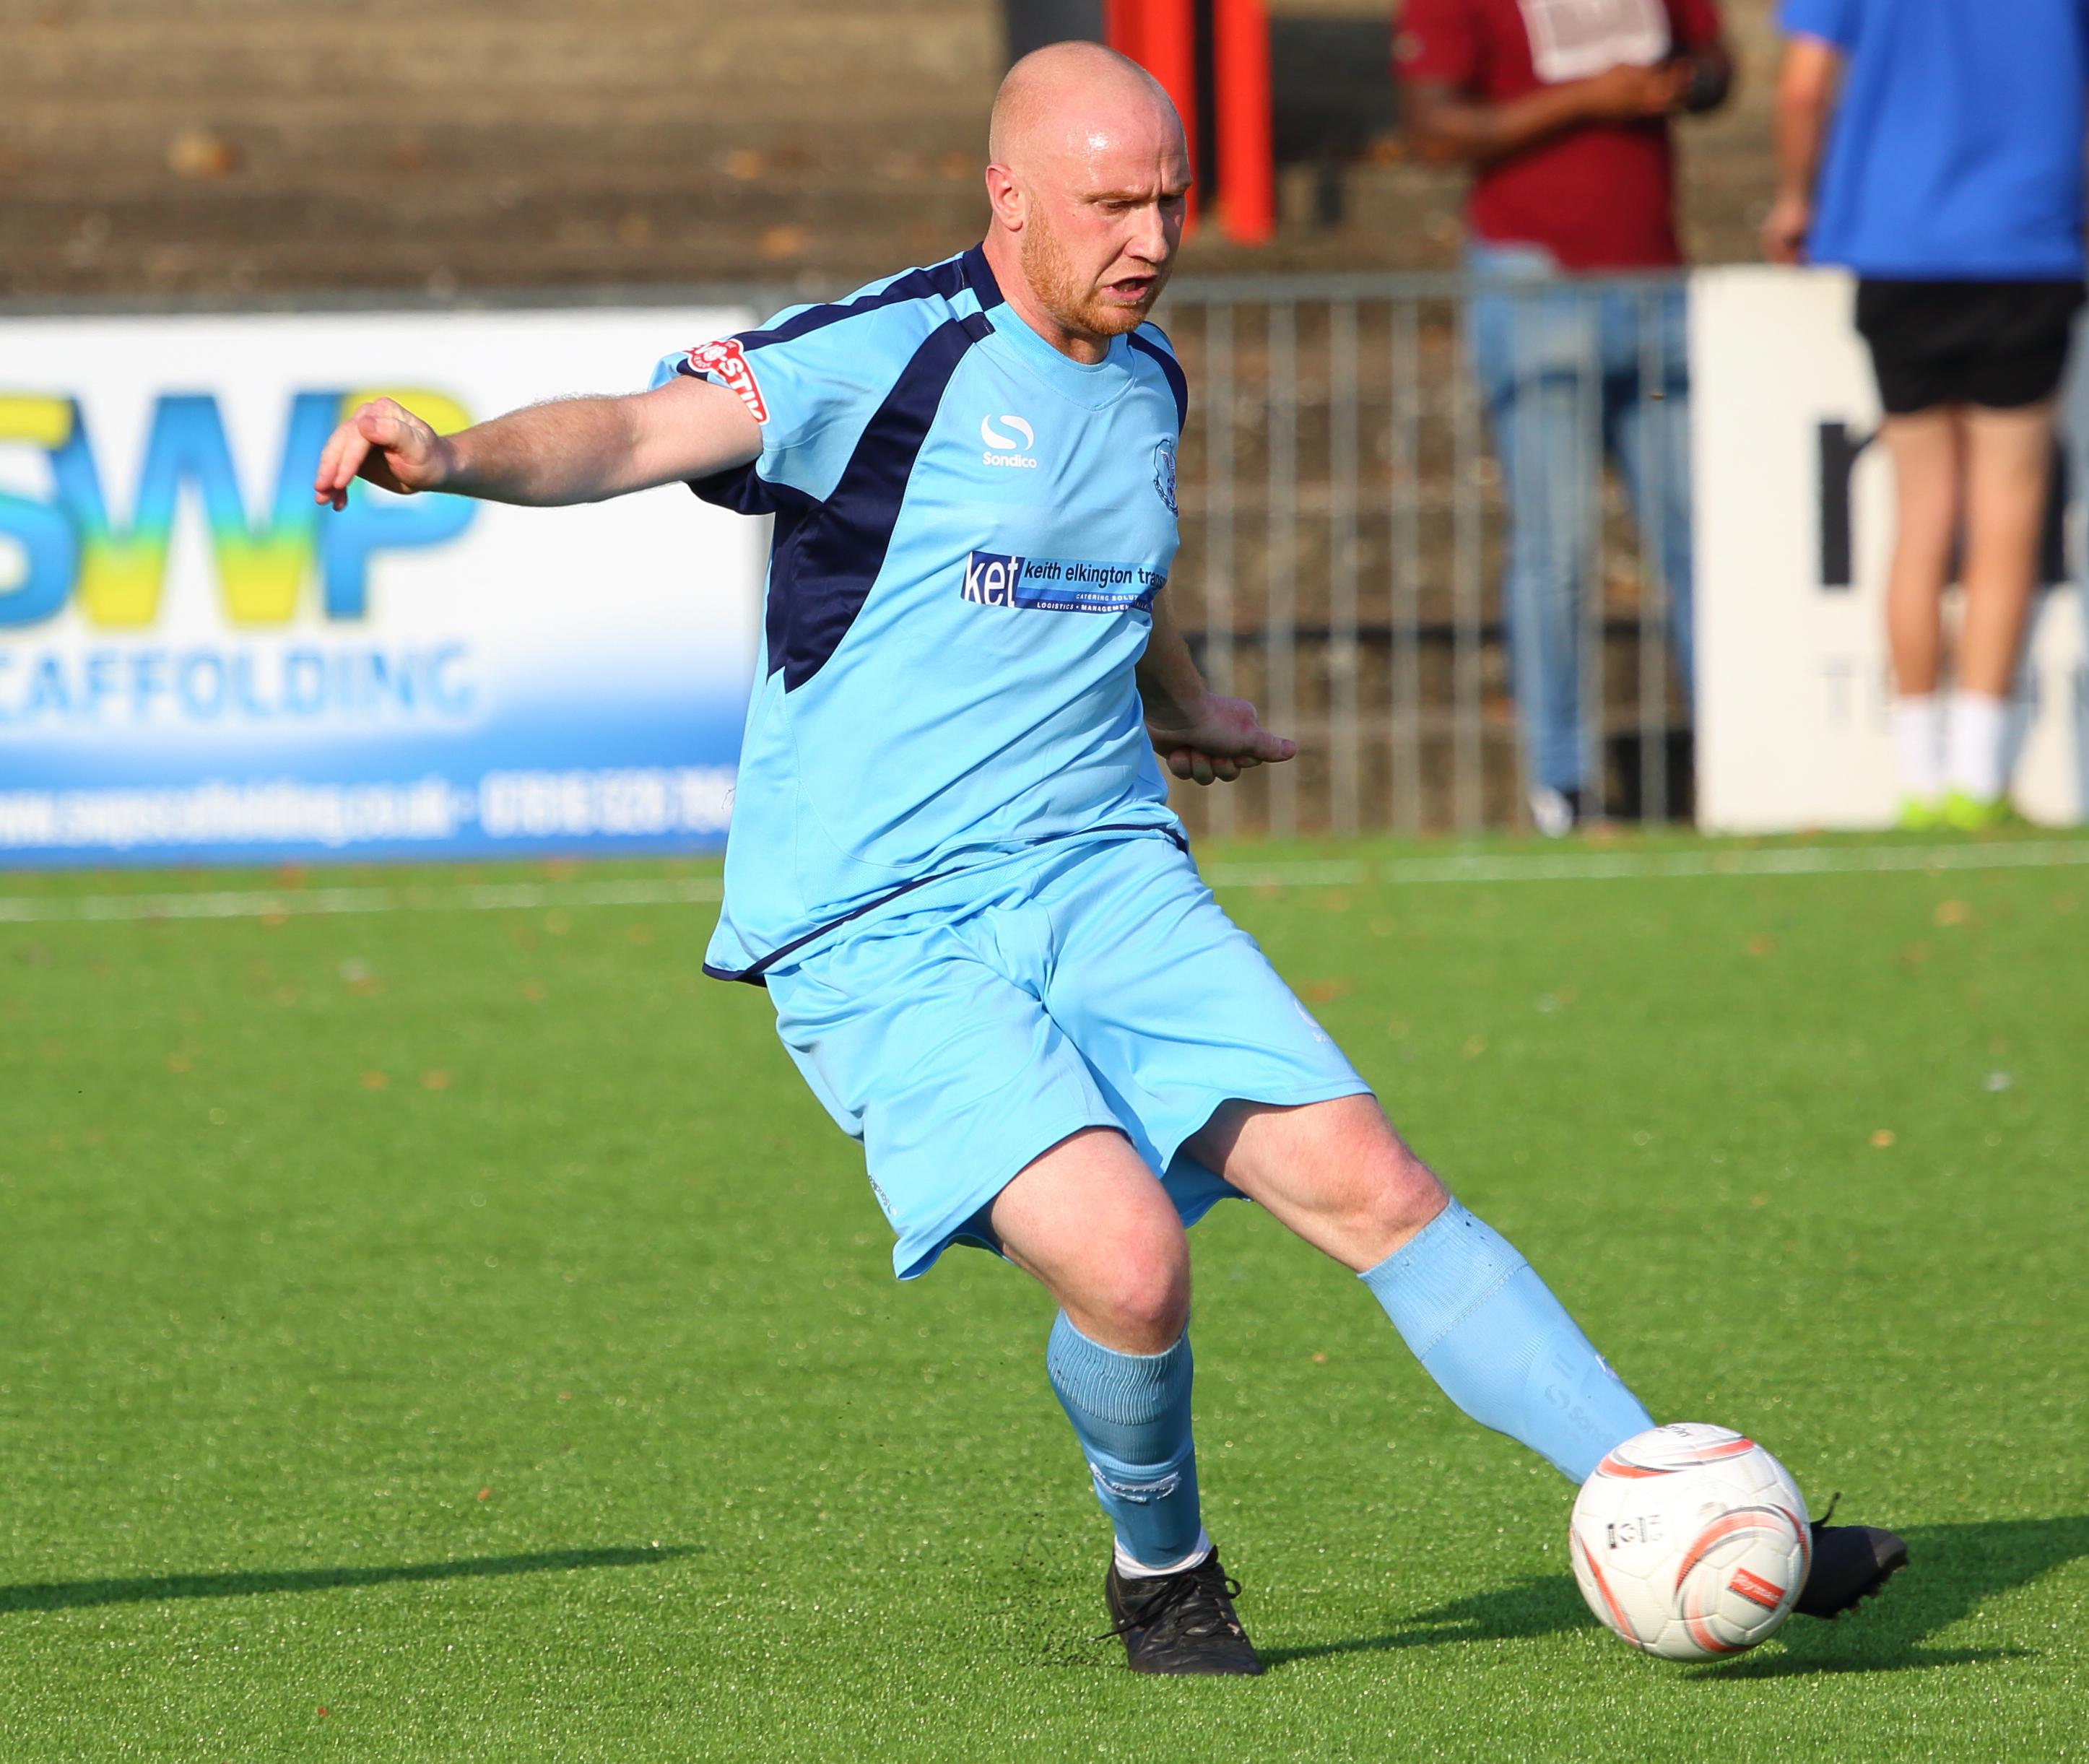 Alex Woodfine. Carshalton v Leighton FA Trophy 2015